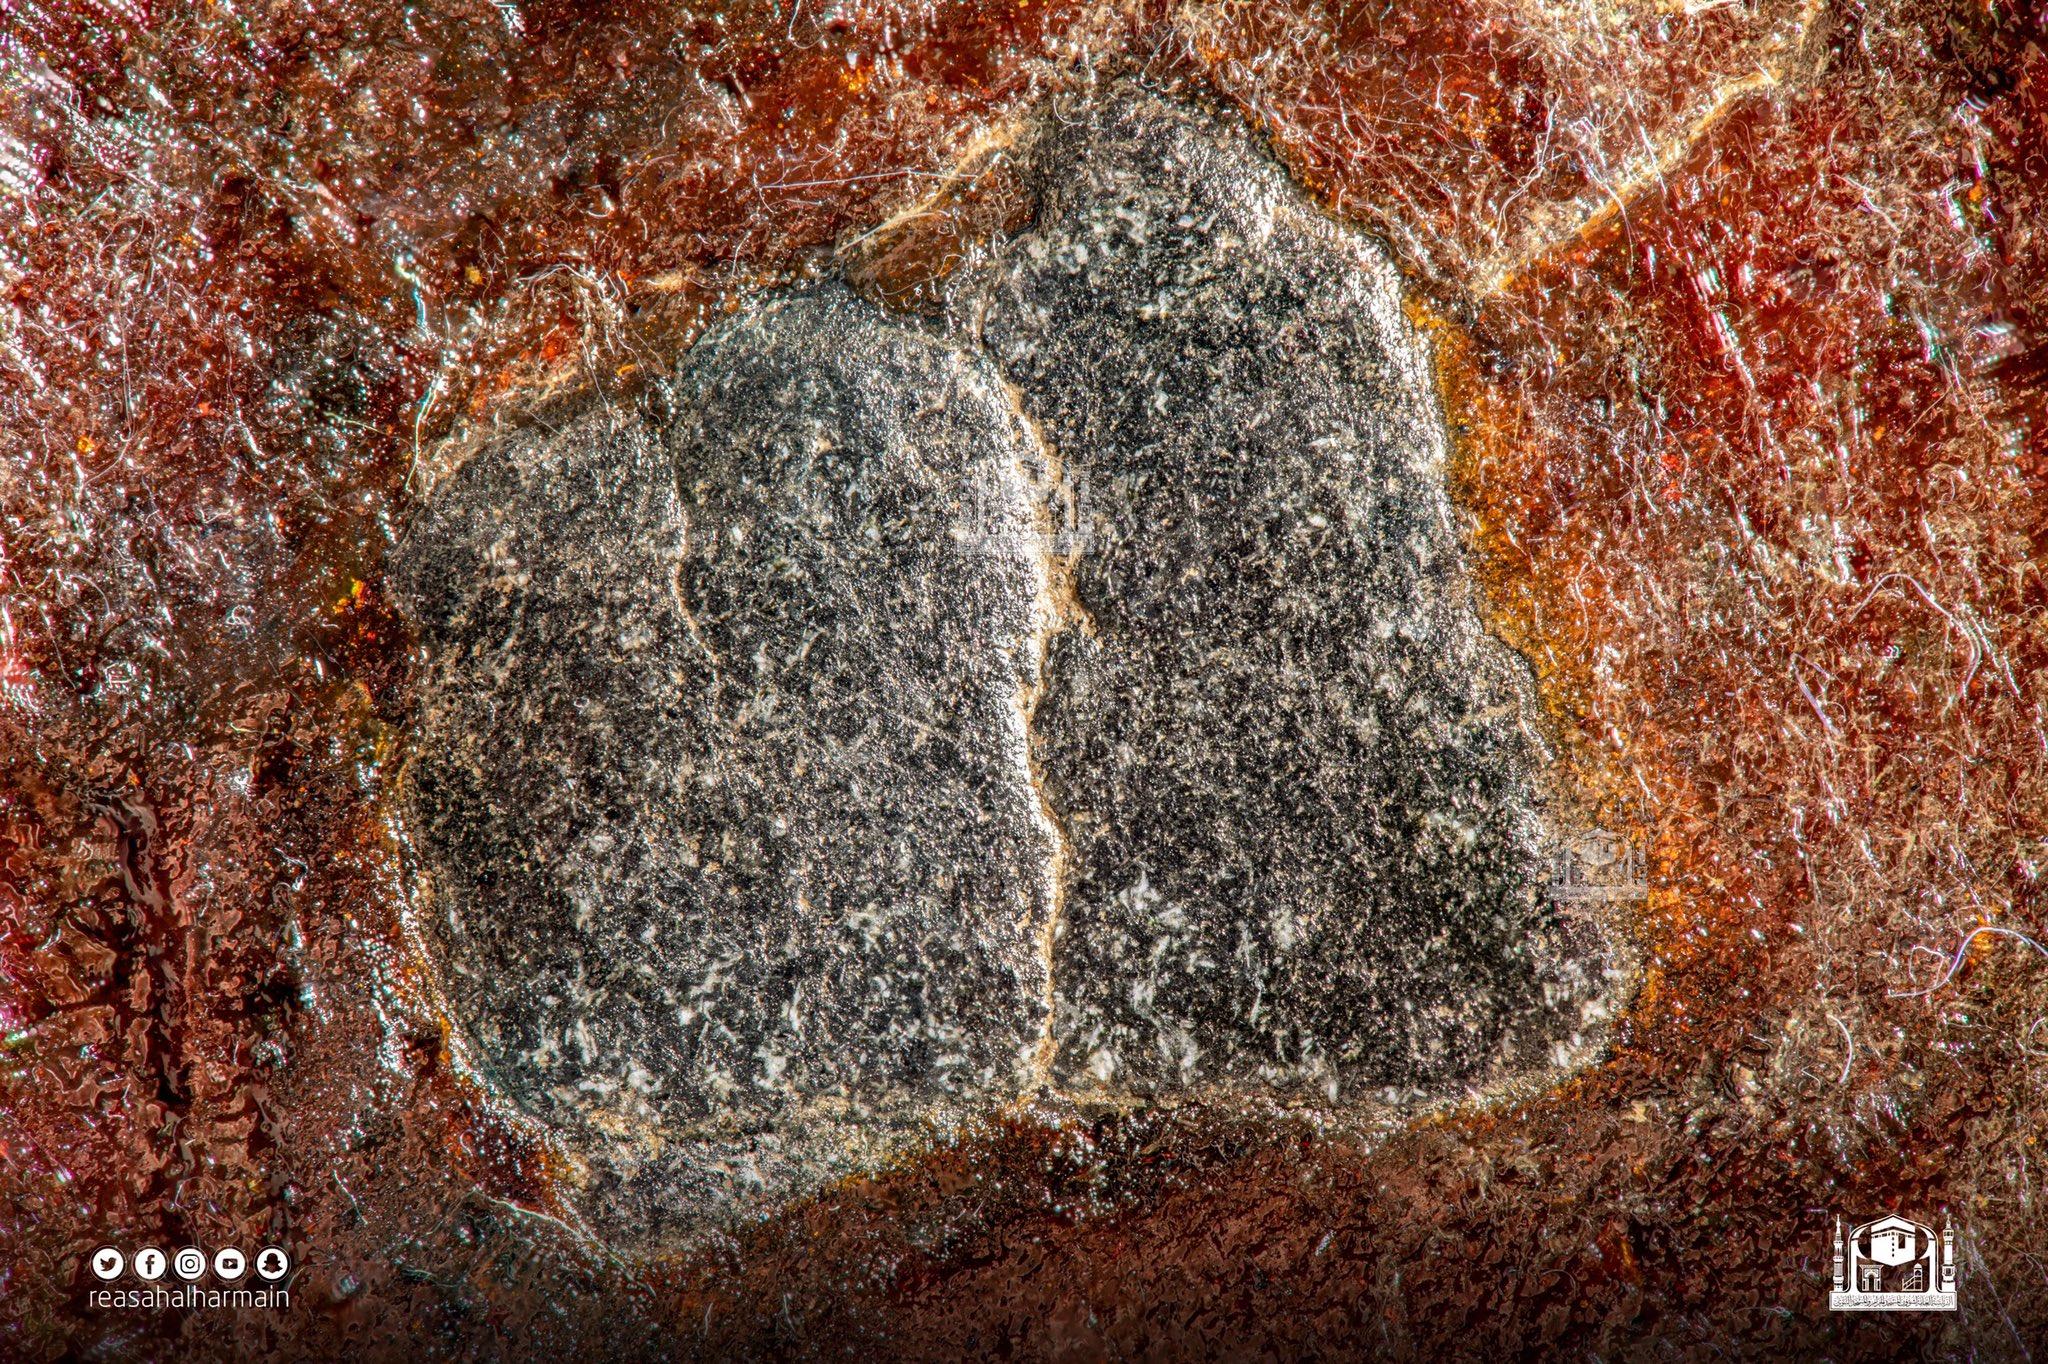 Saudi Arabia release pictures of Black Stone in Mecca 2021